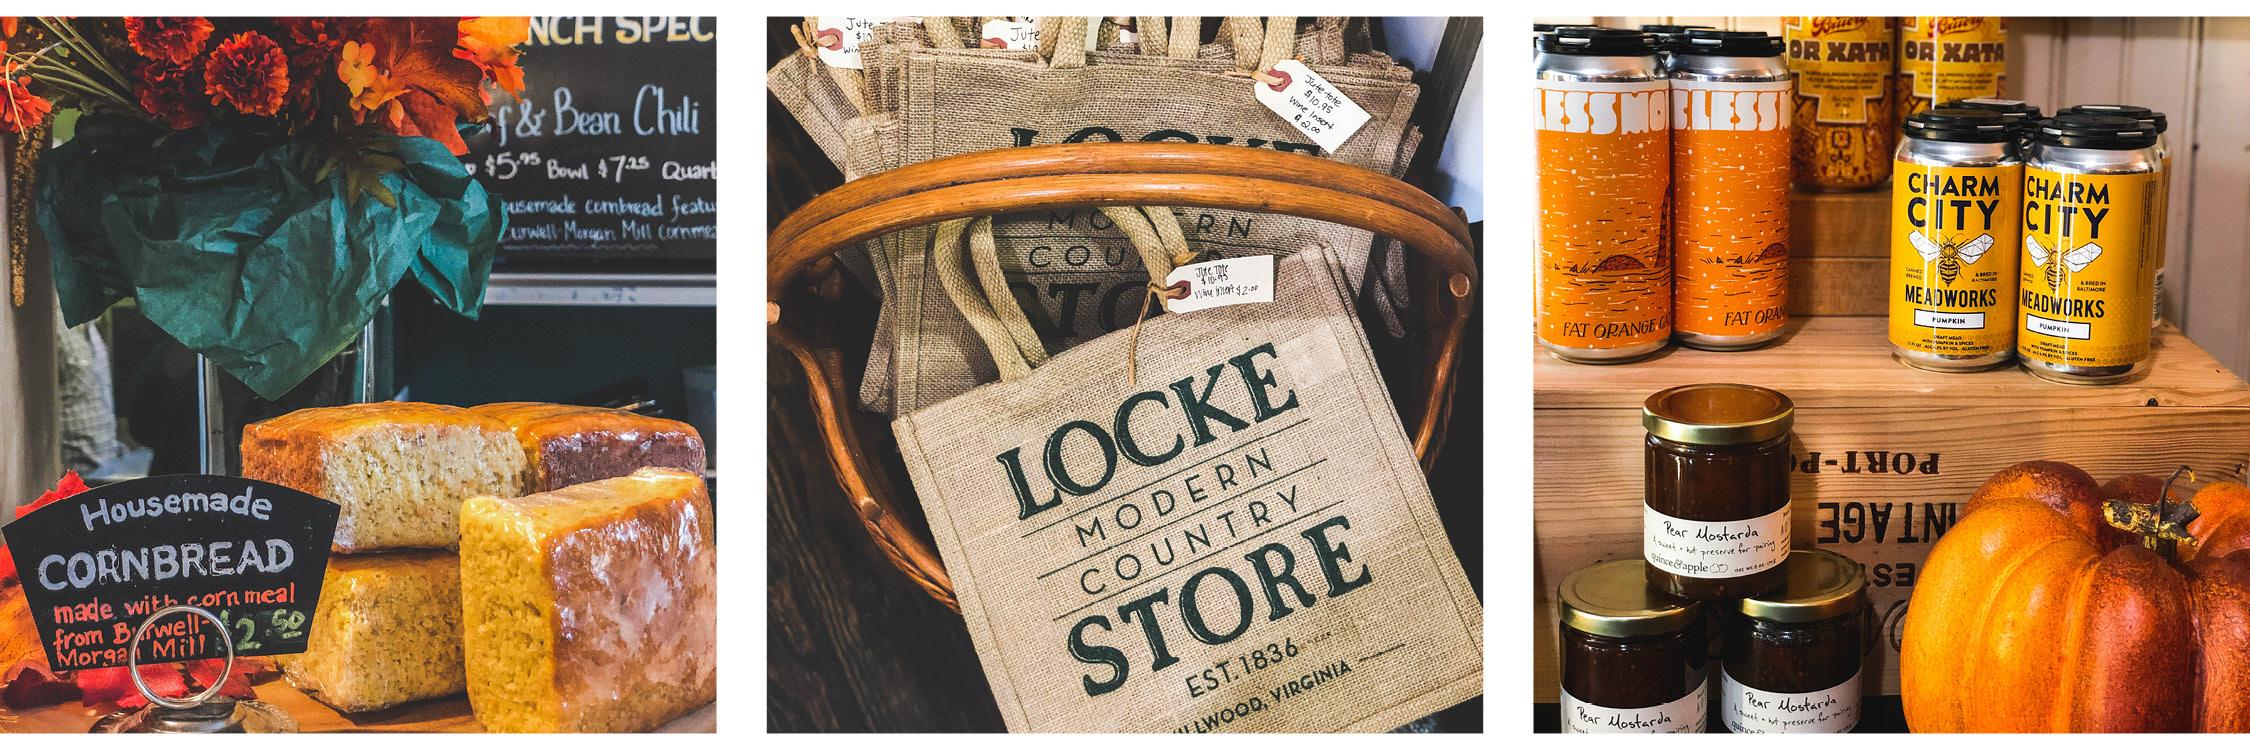 Locke Store-finals7.jpg